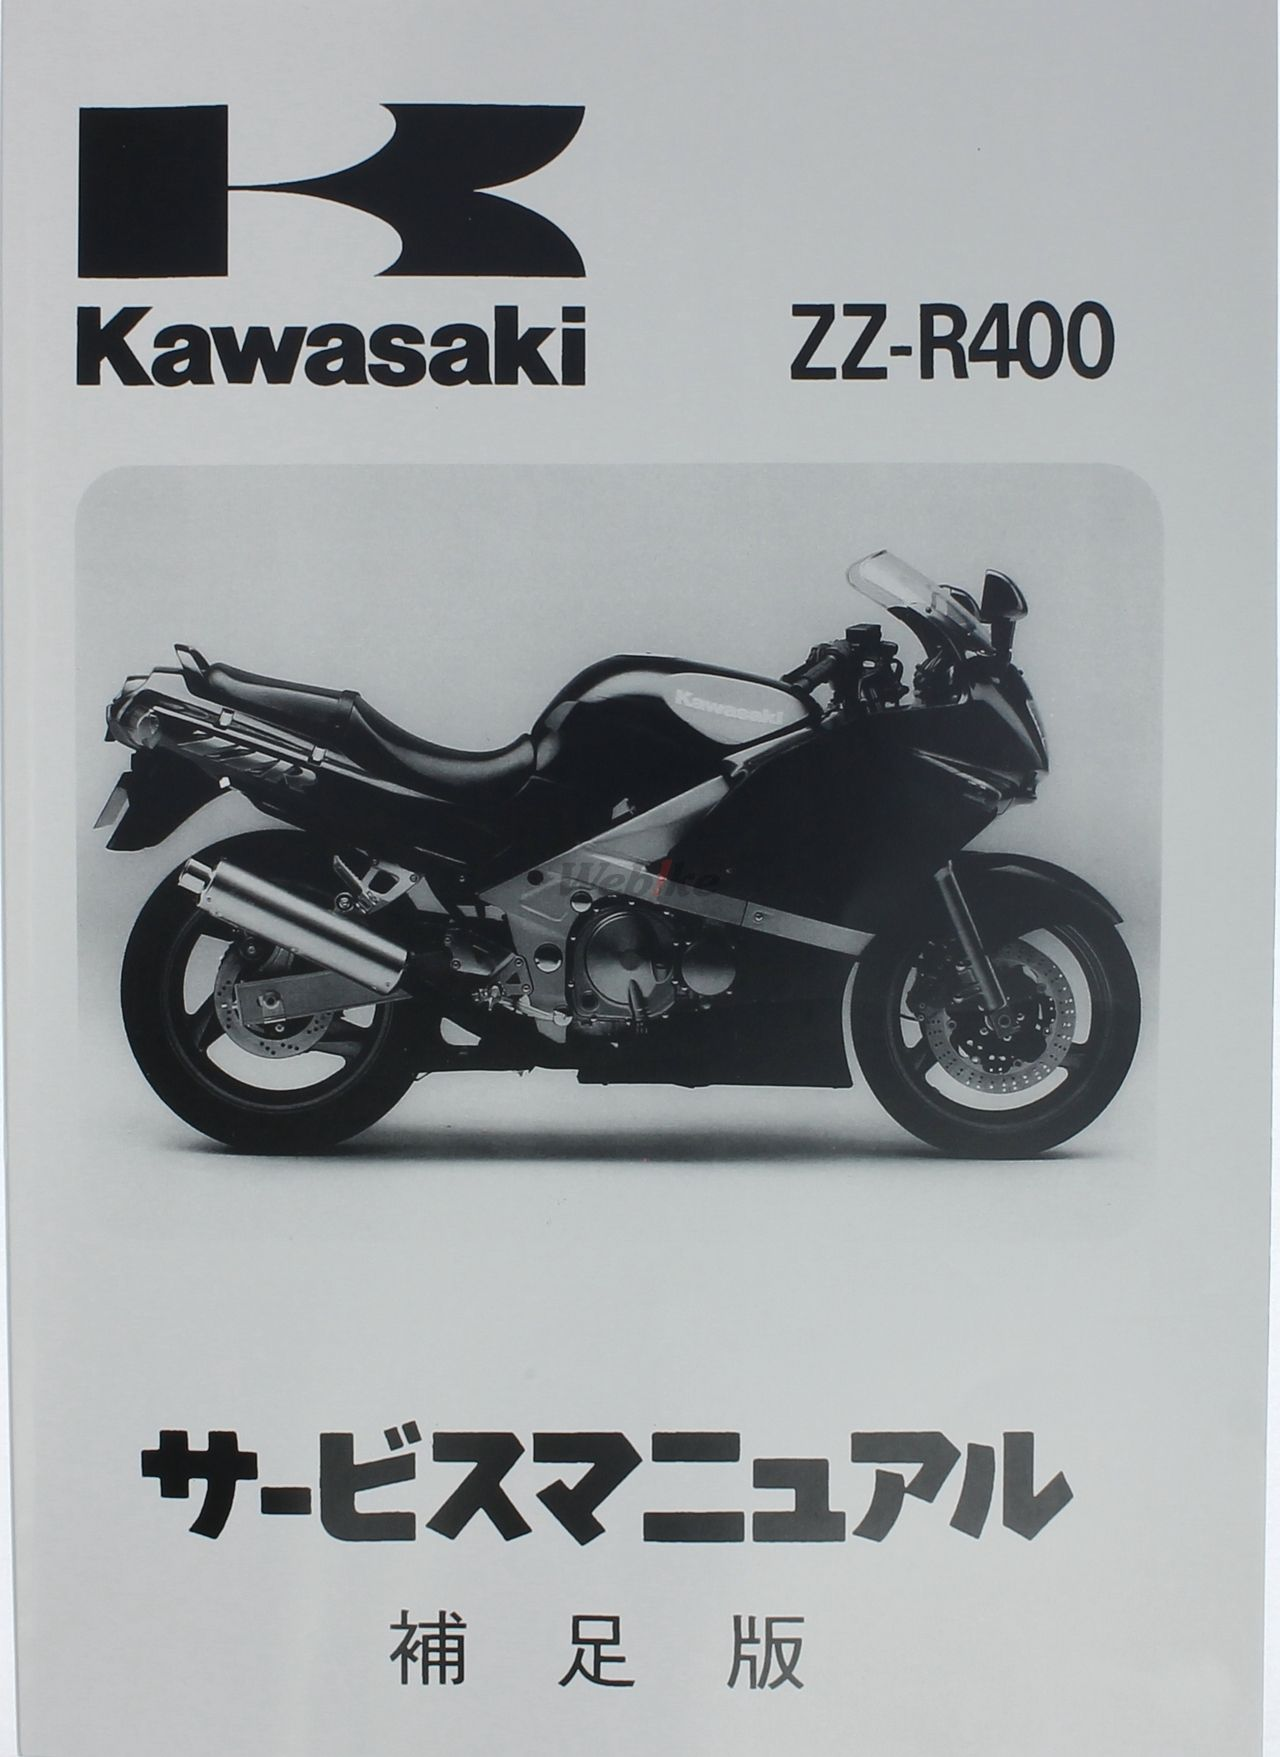 【KAWASAKI】ZZR400 維修手冊(補充完整版) - 「Webike-摩托百貨」